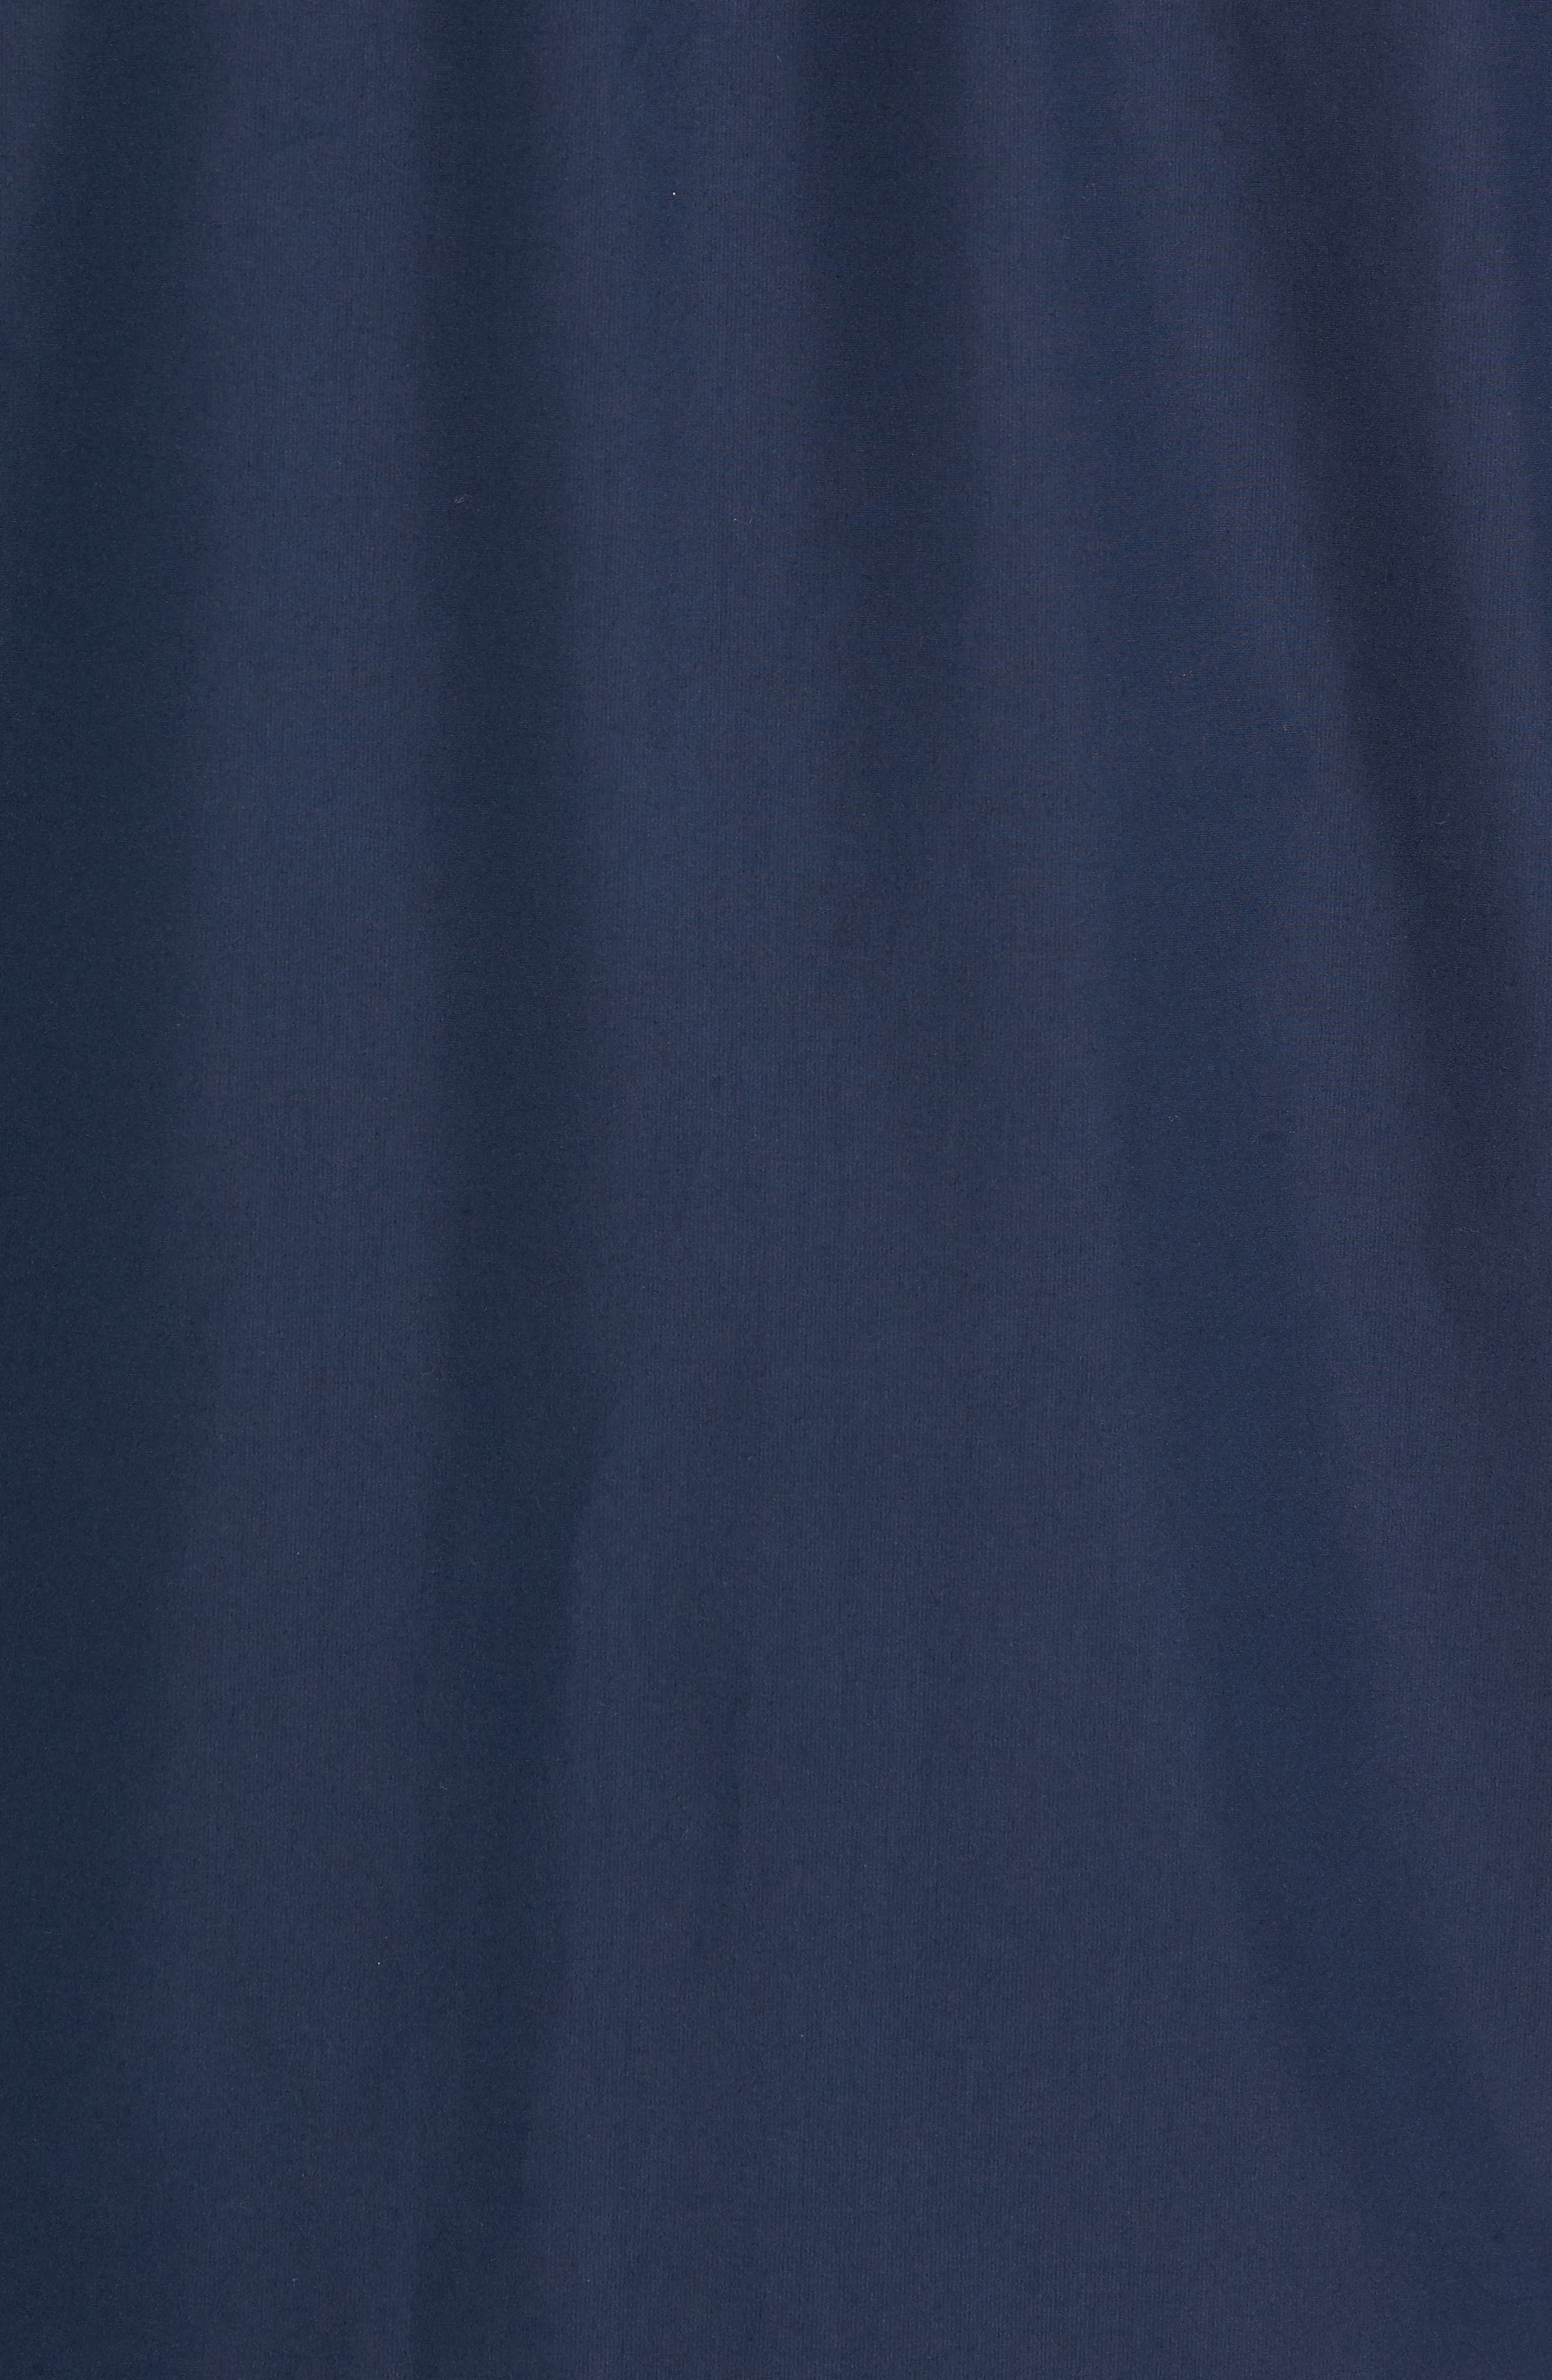 Regatta Performance Jacket,                             Alternate thumbnail 7, color,                             410